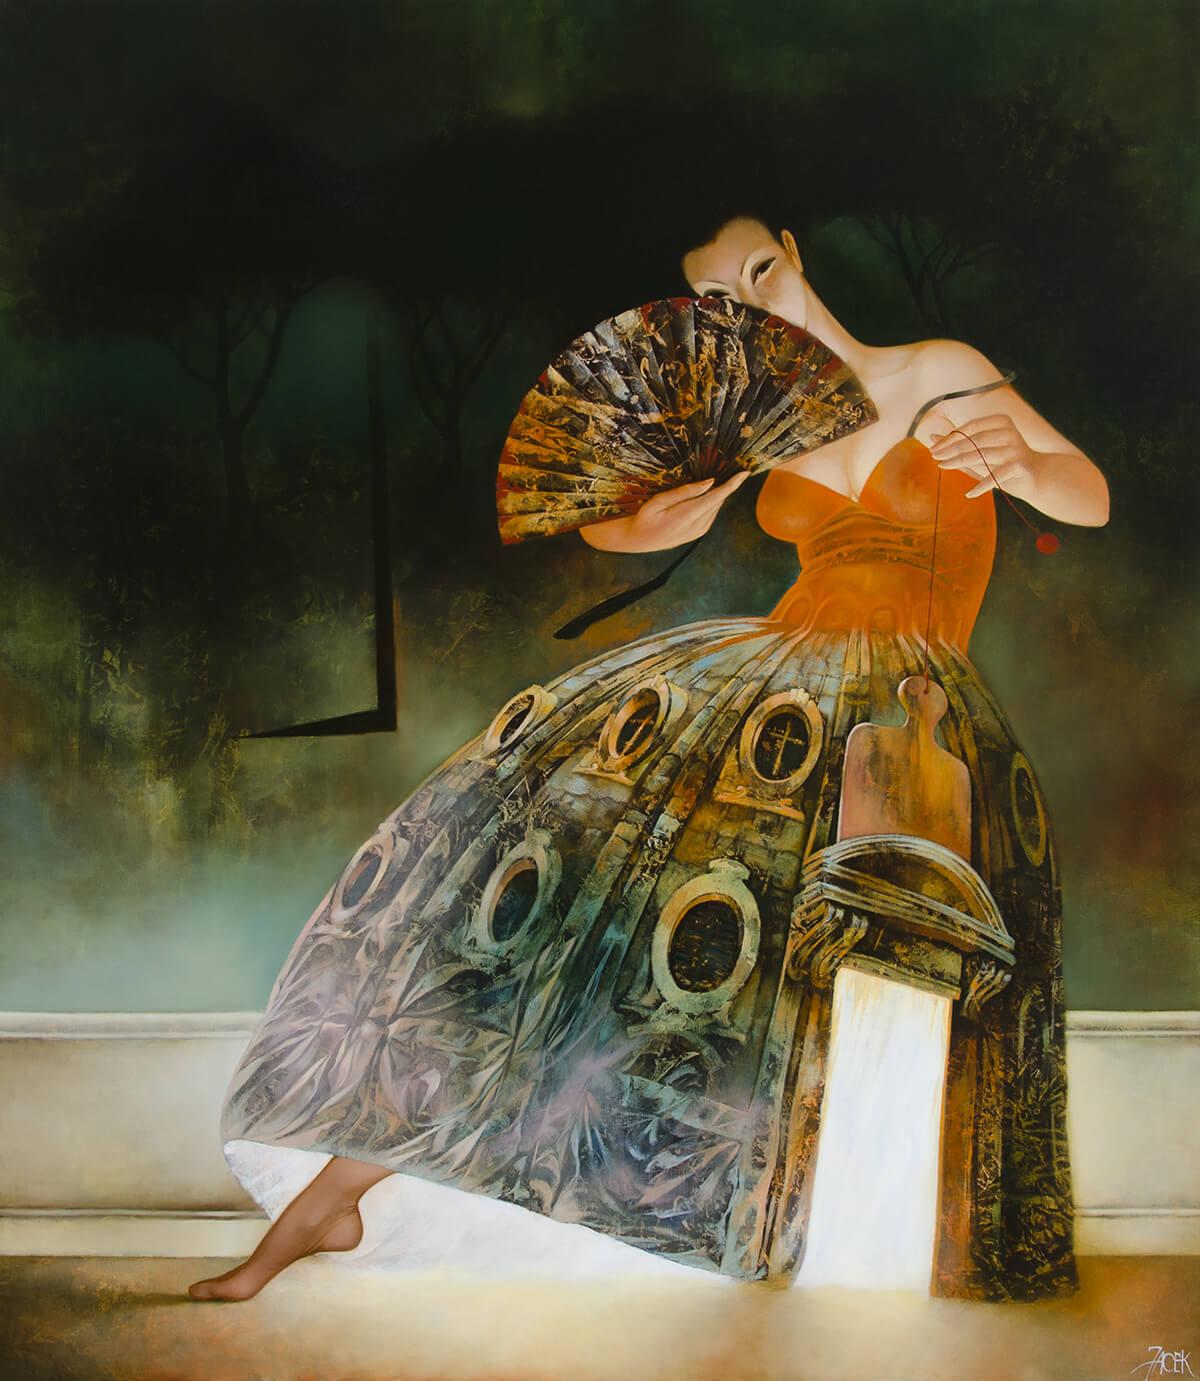 oil on canvas, 110 x 90 cm, 2012